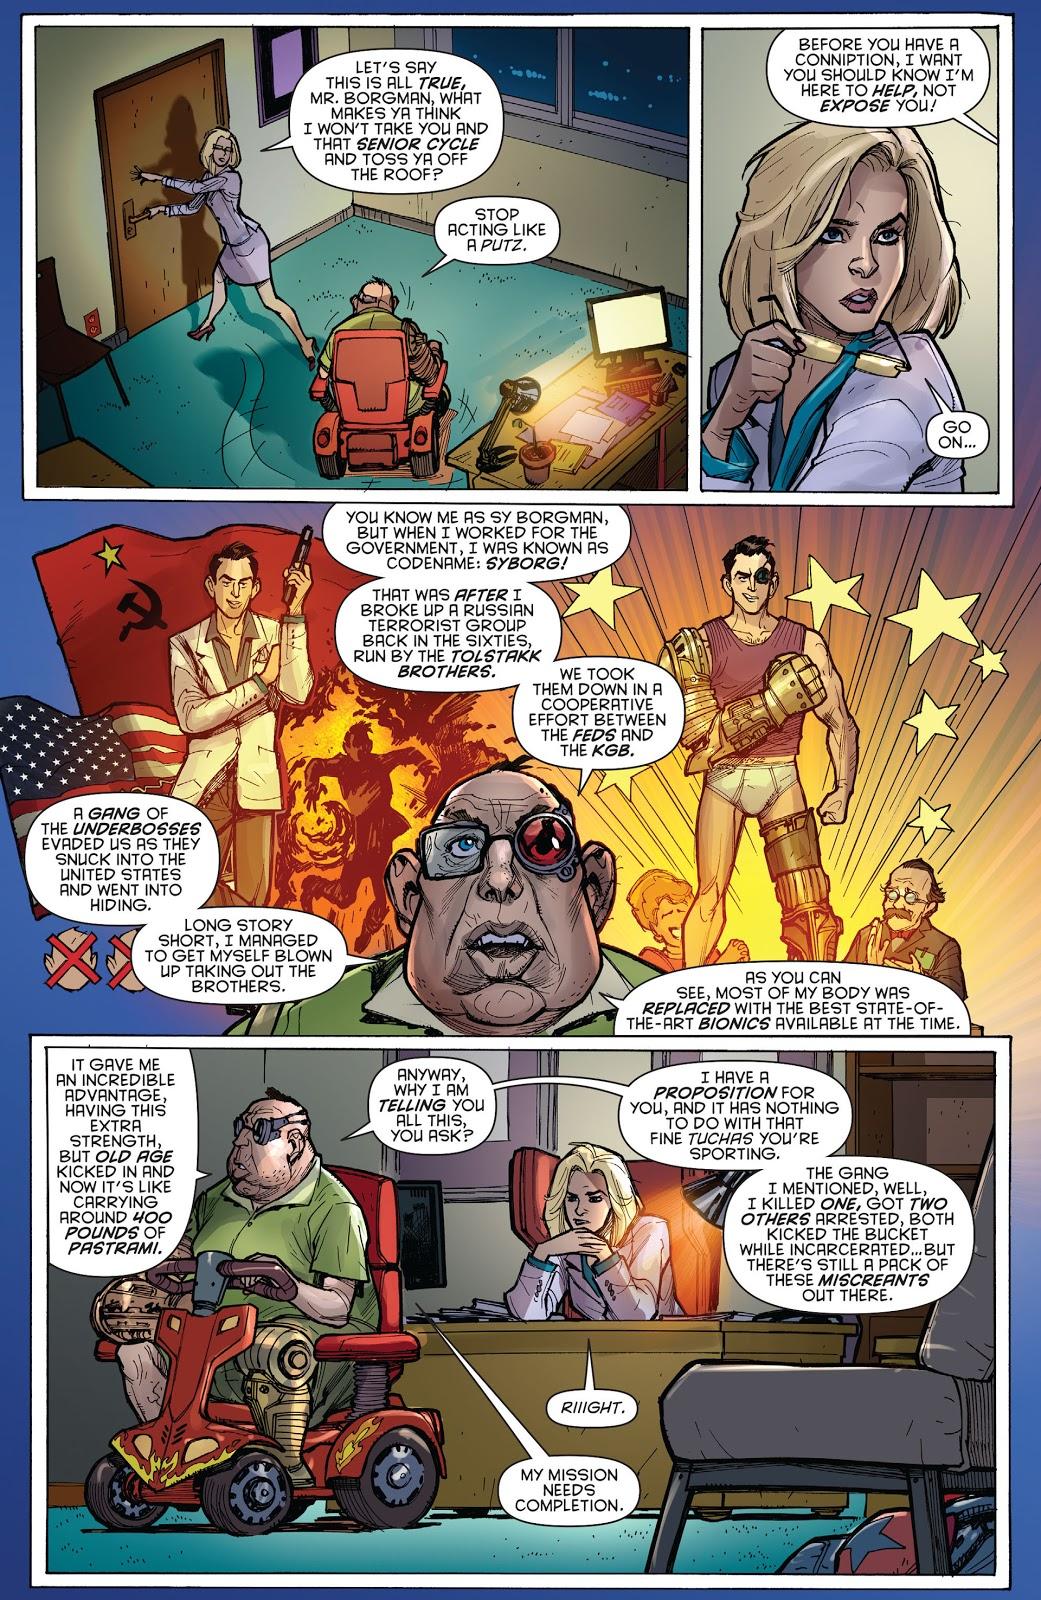 Harley Quinn Meets Sy Borgman